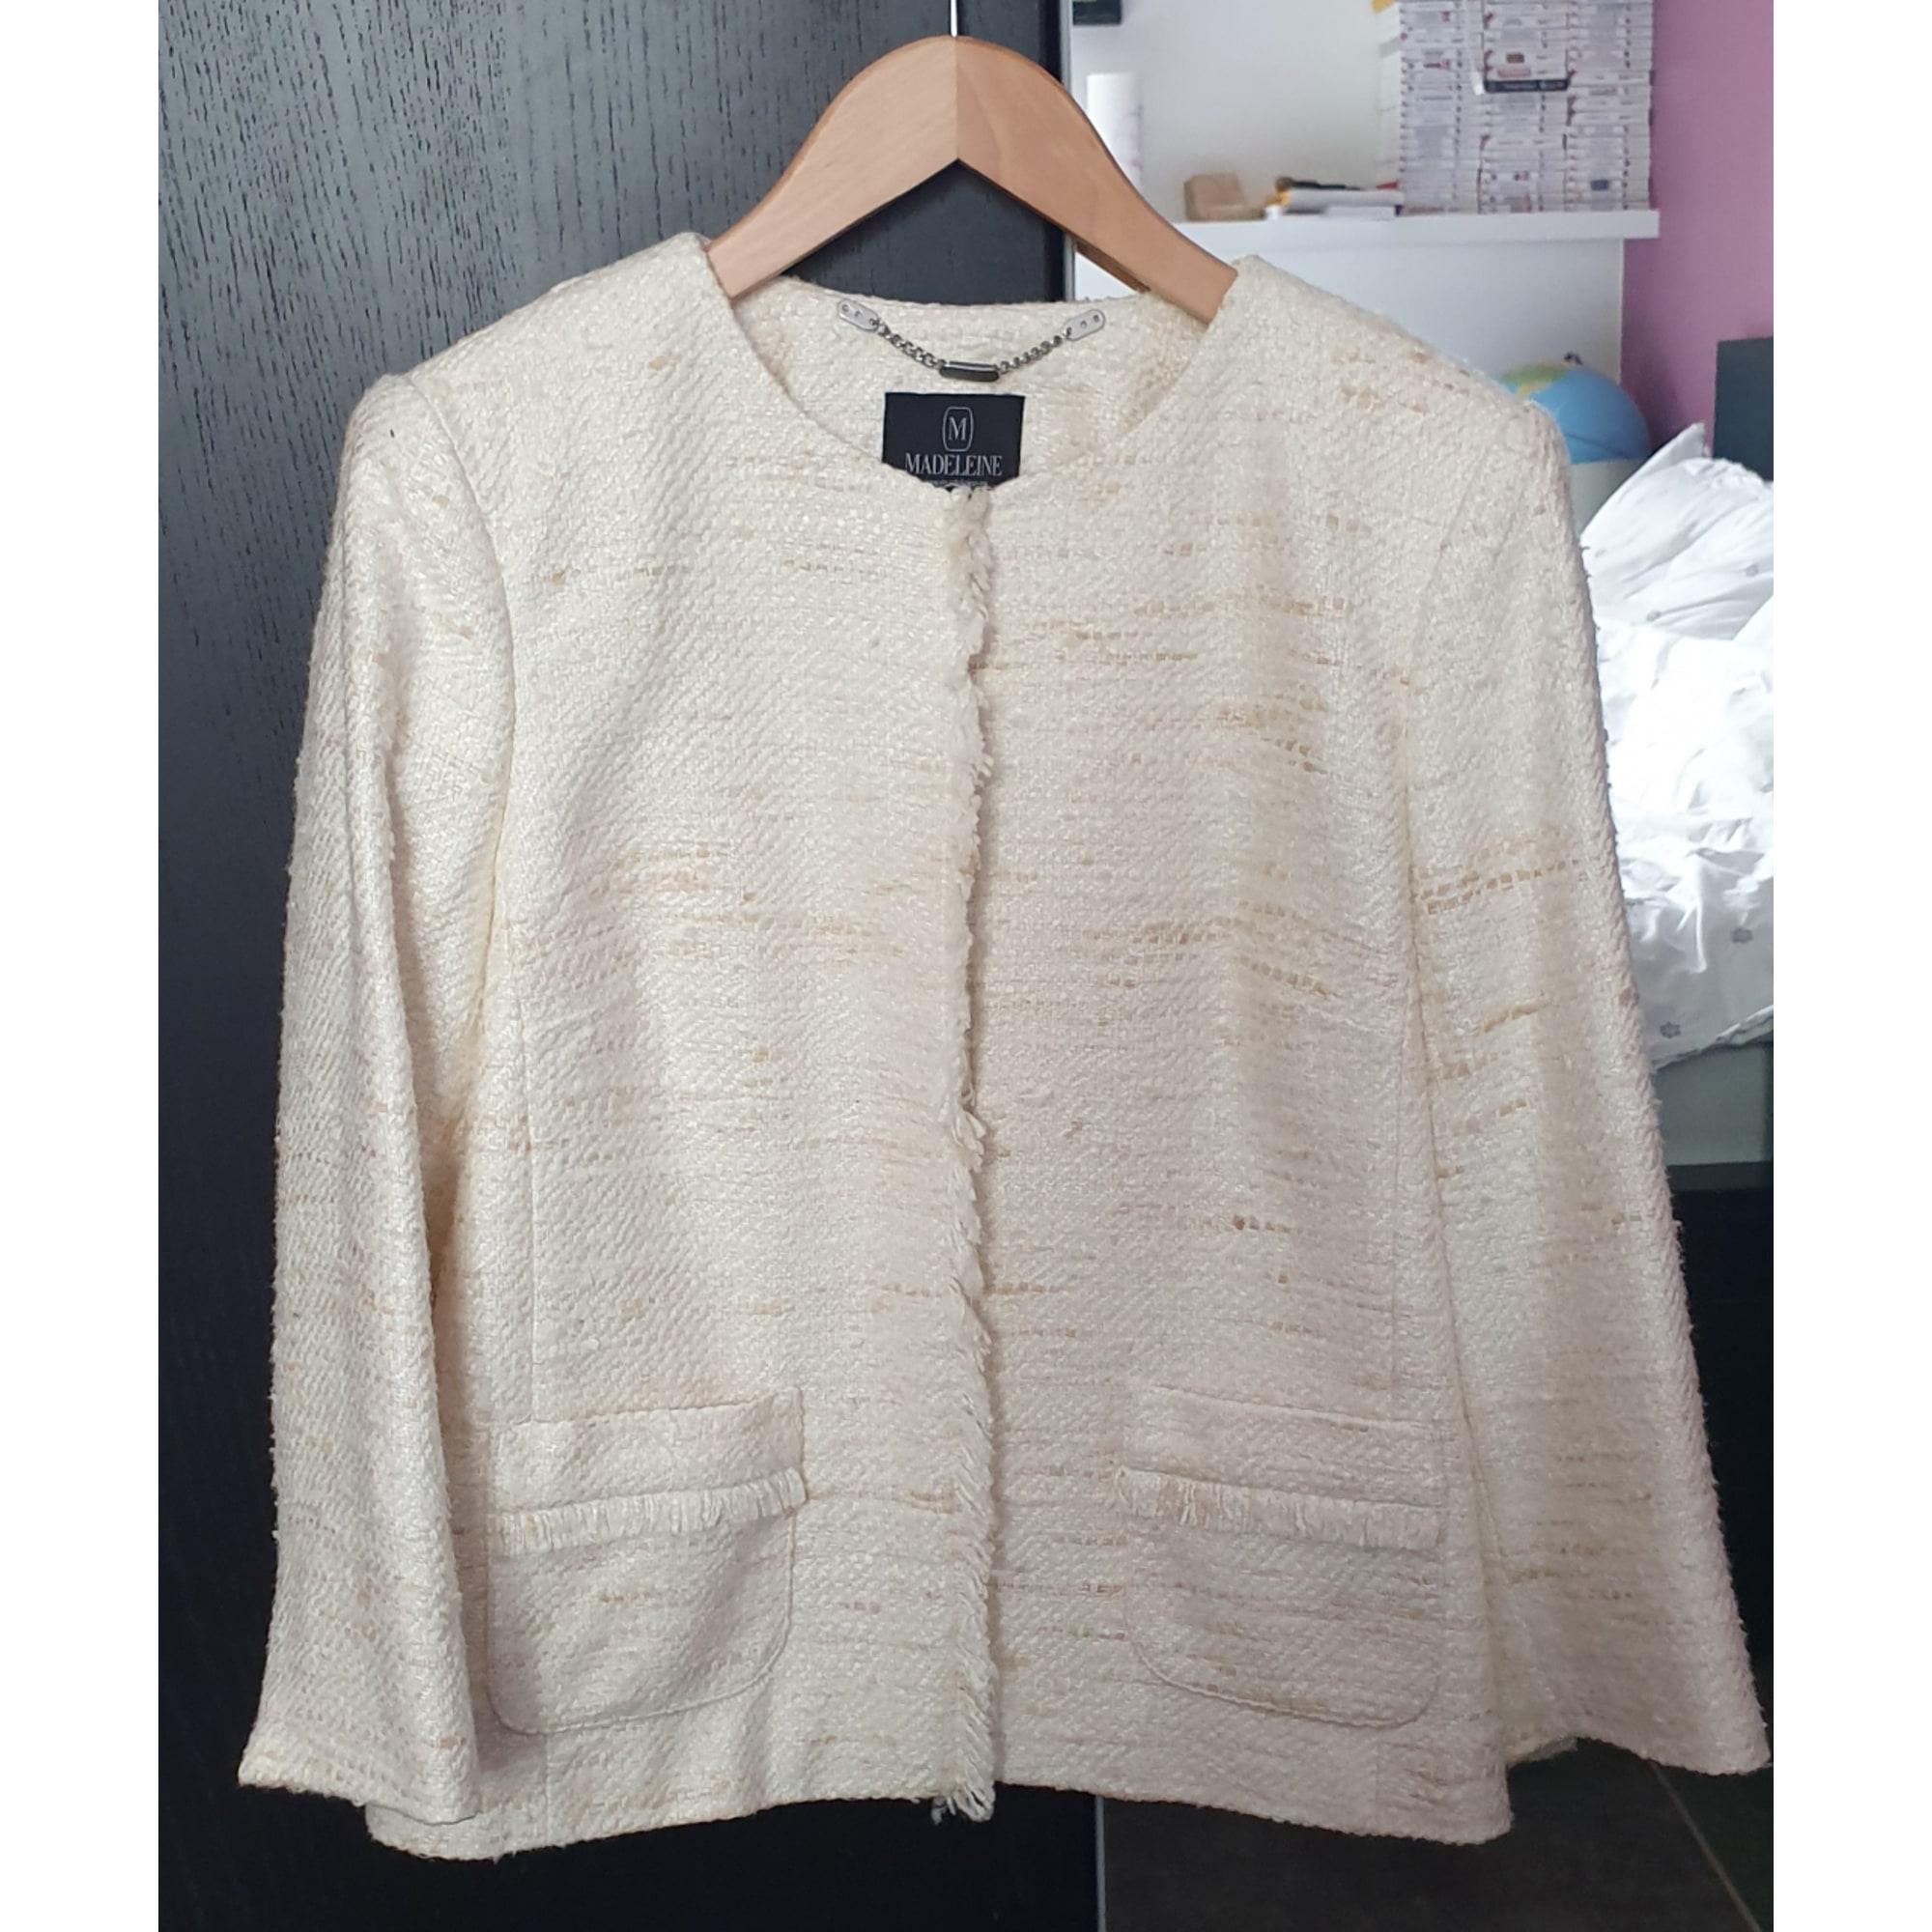 Blazer, veste tailleur MADELEINE Blanc, blanc cassé, écru